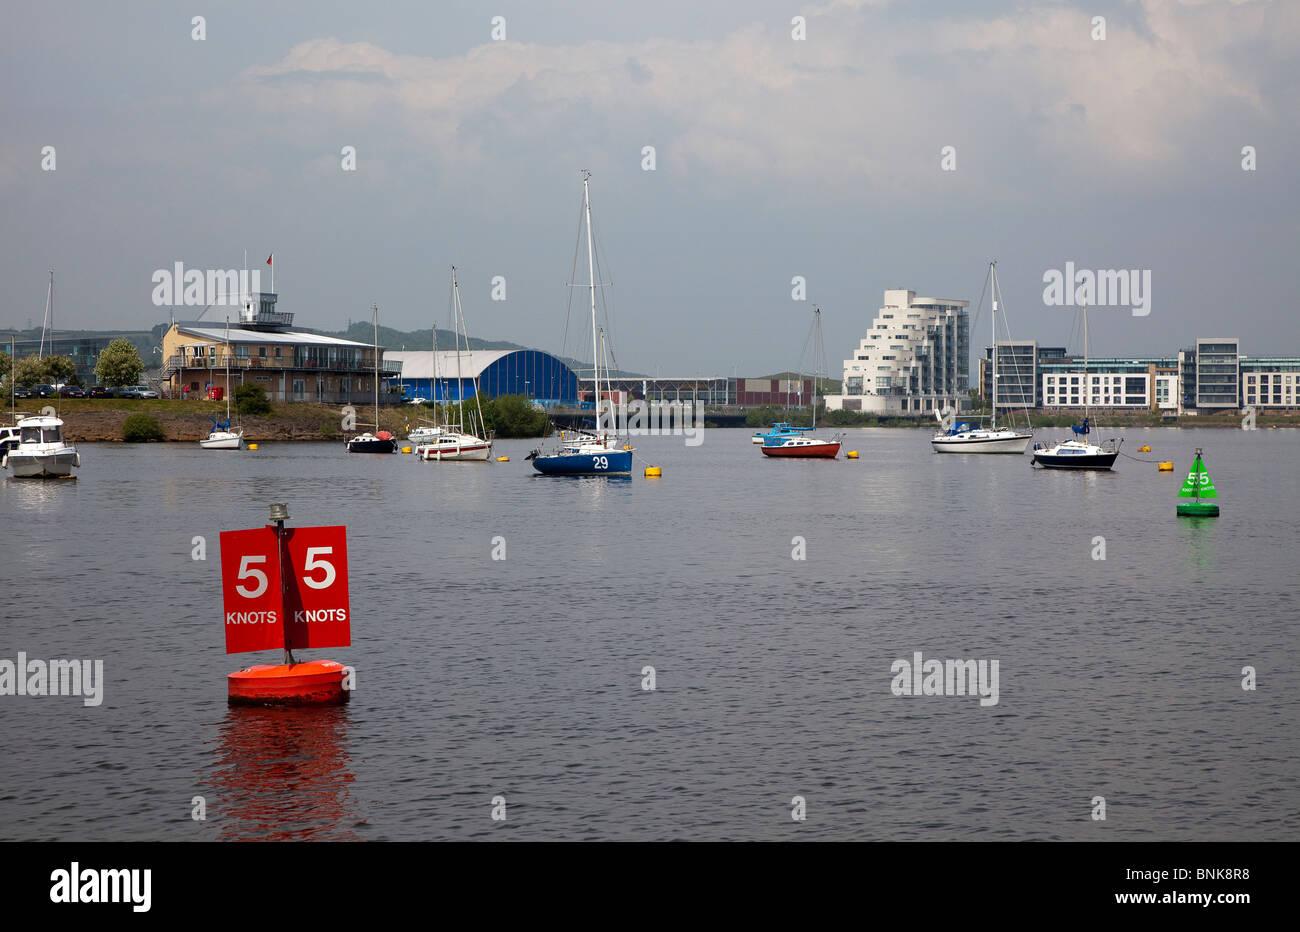 Speed limit sign on buoy Cardiff Bay Wales UK - Stock Image